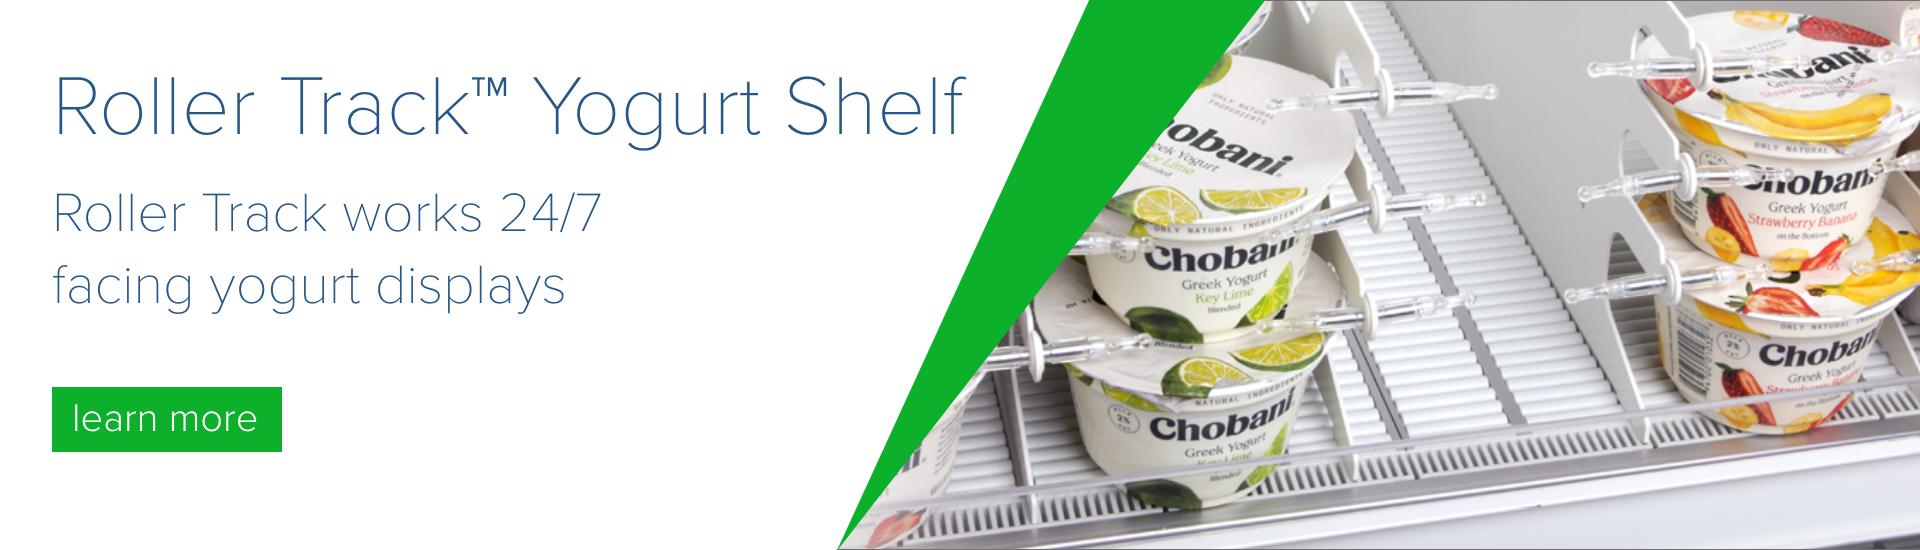 roller track yogurt